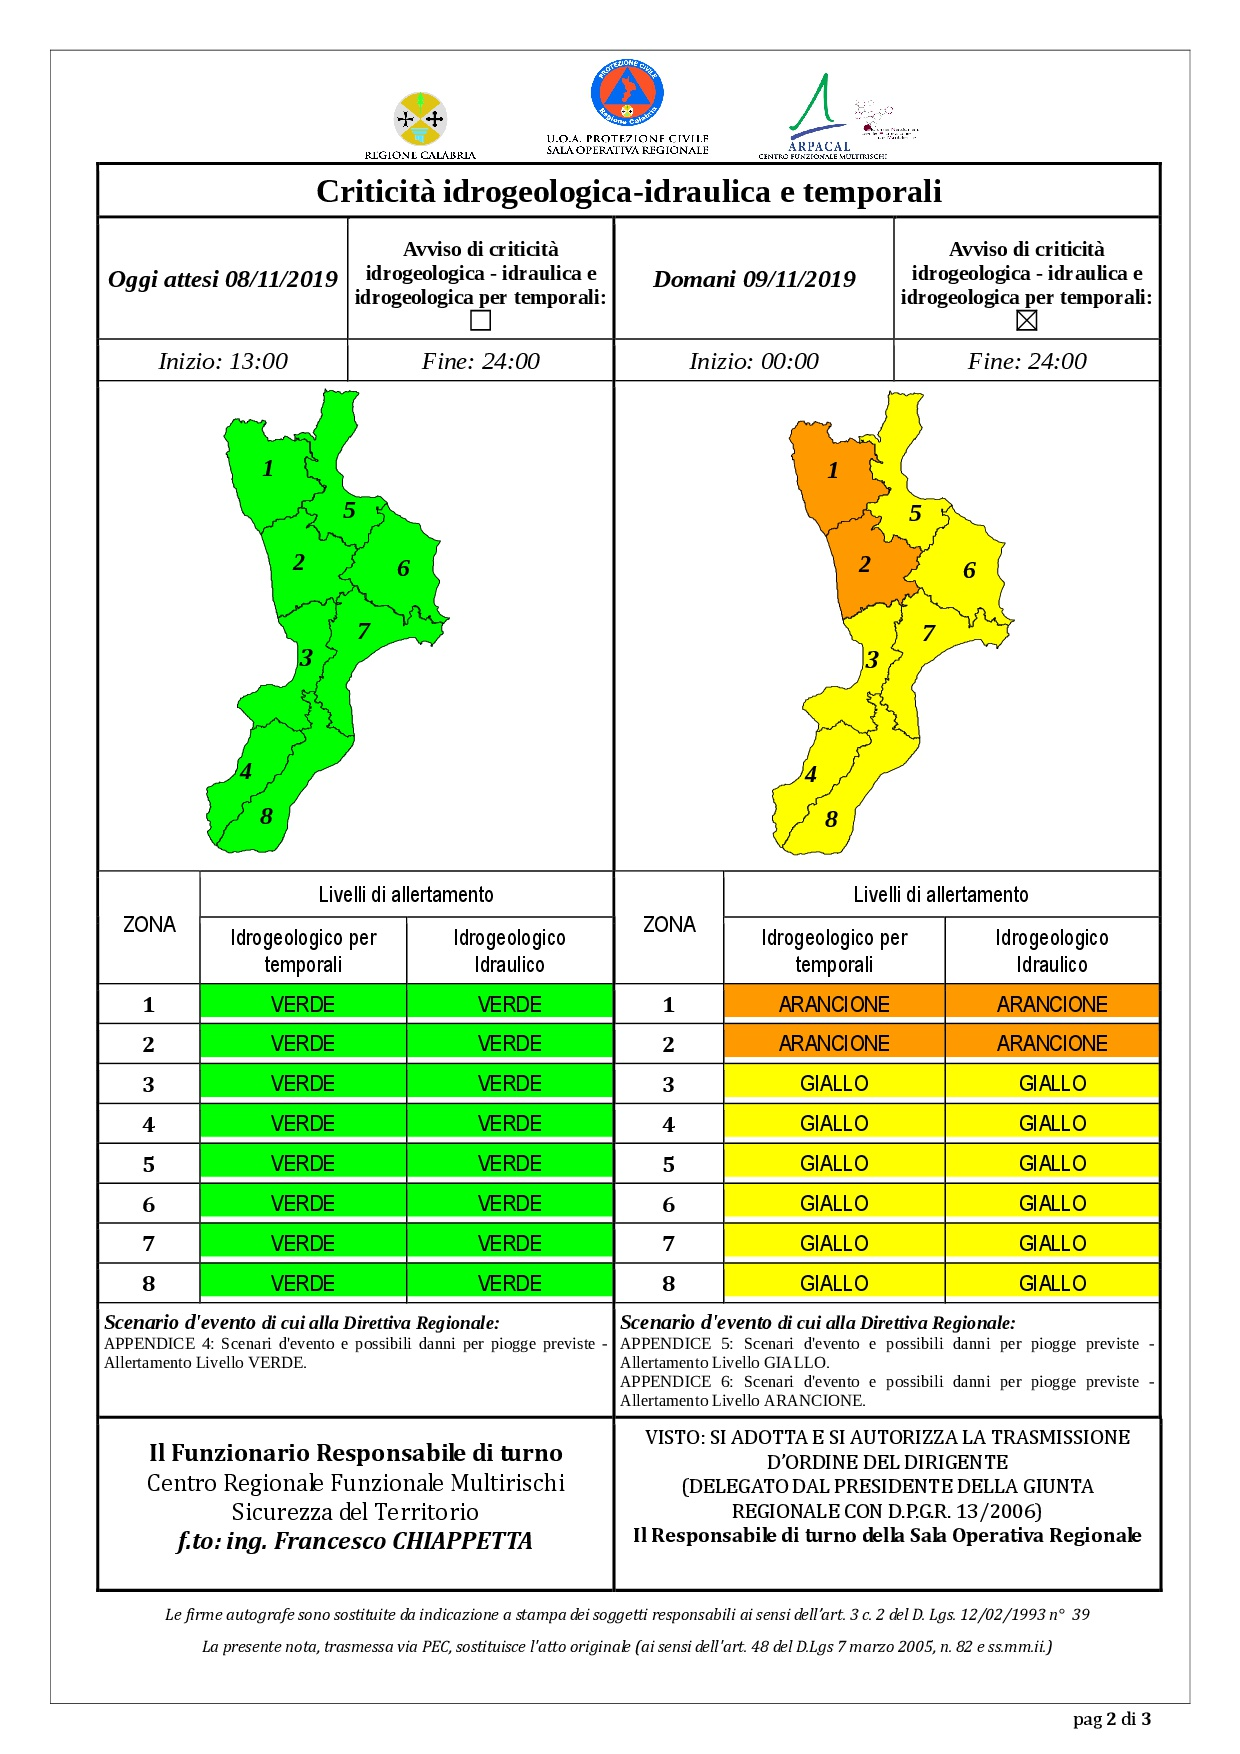 Criticità idrogeologica-idraulica e temporali in Calabria 08-11-2019